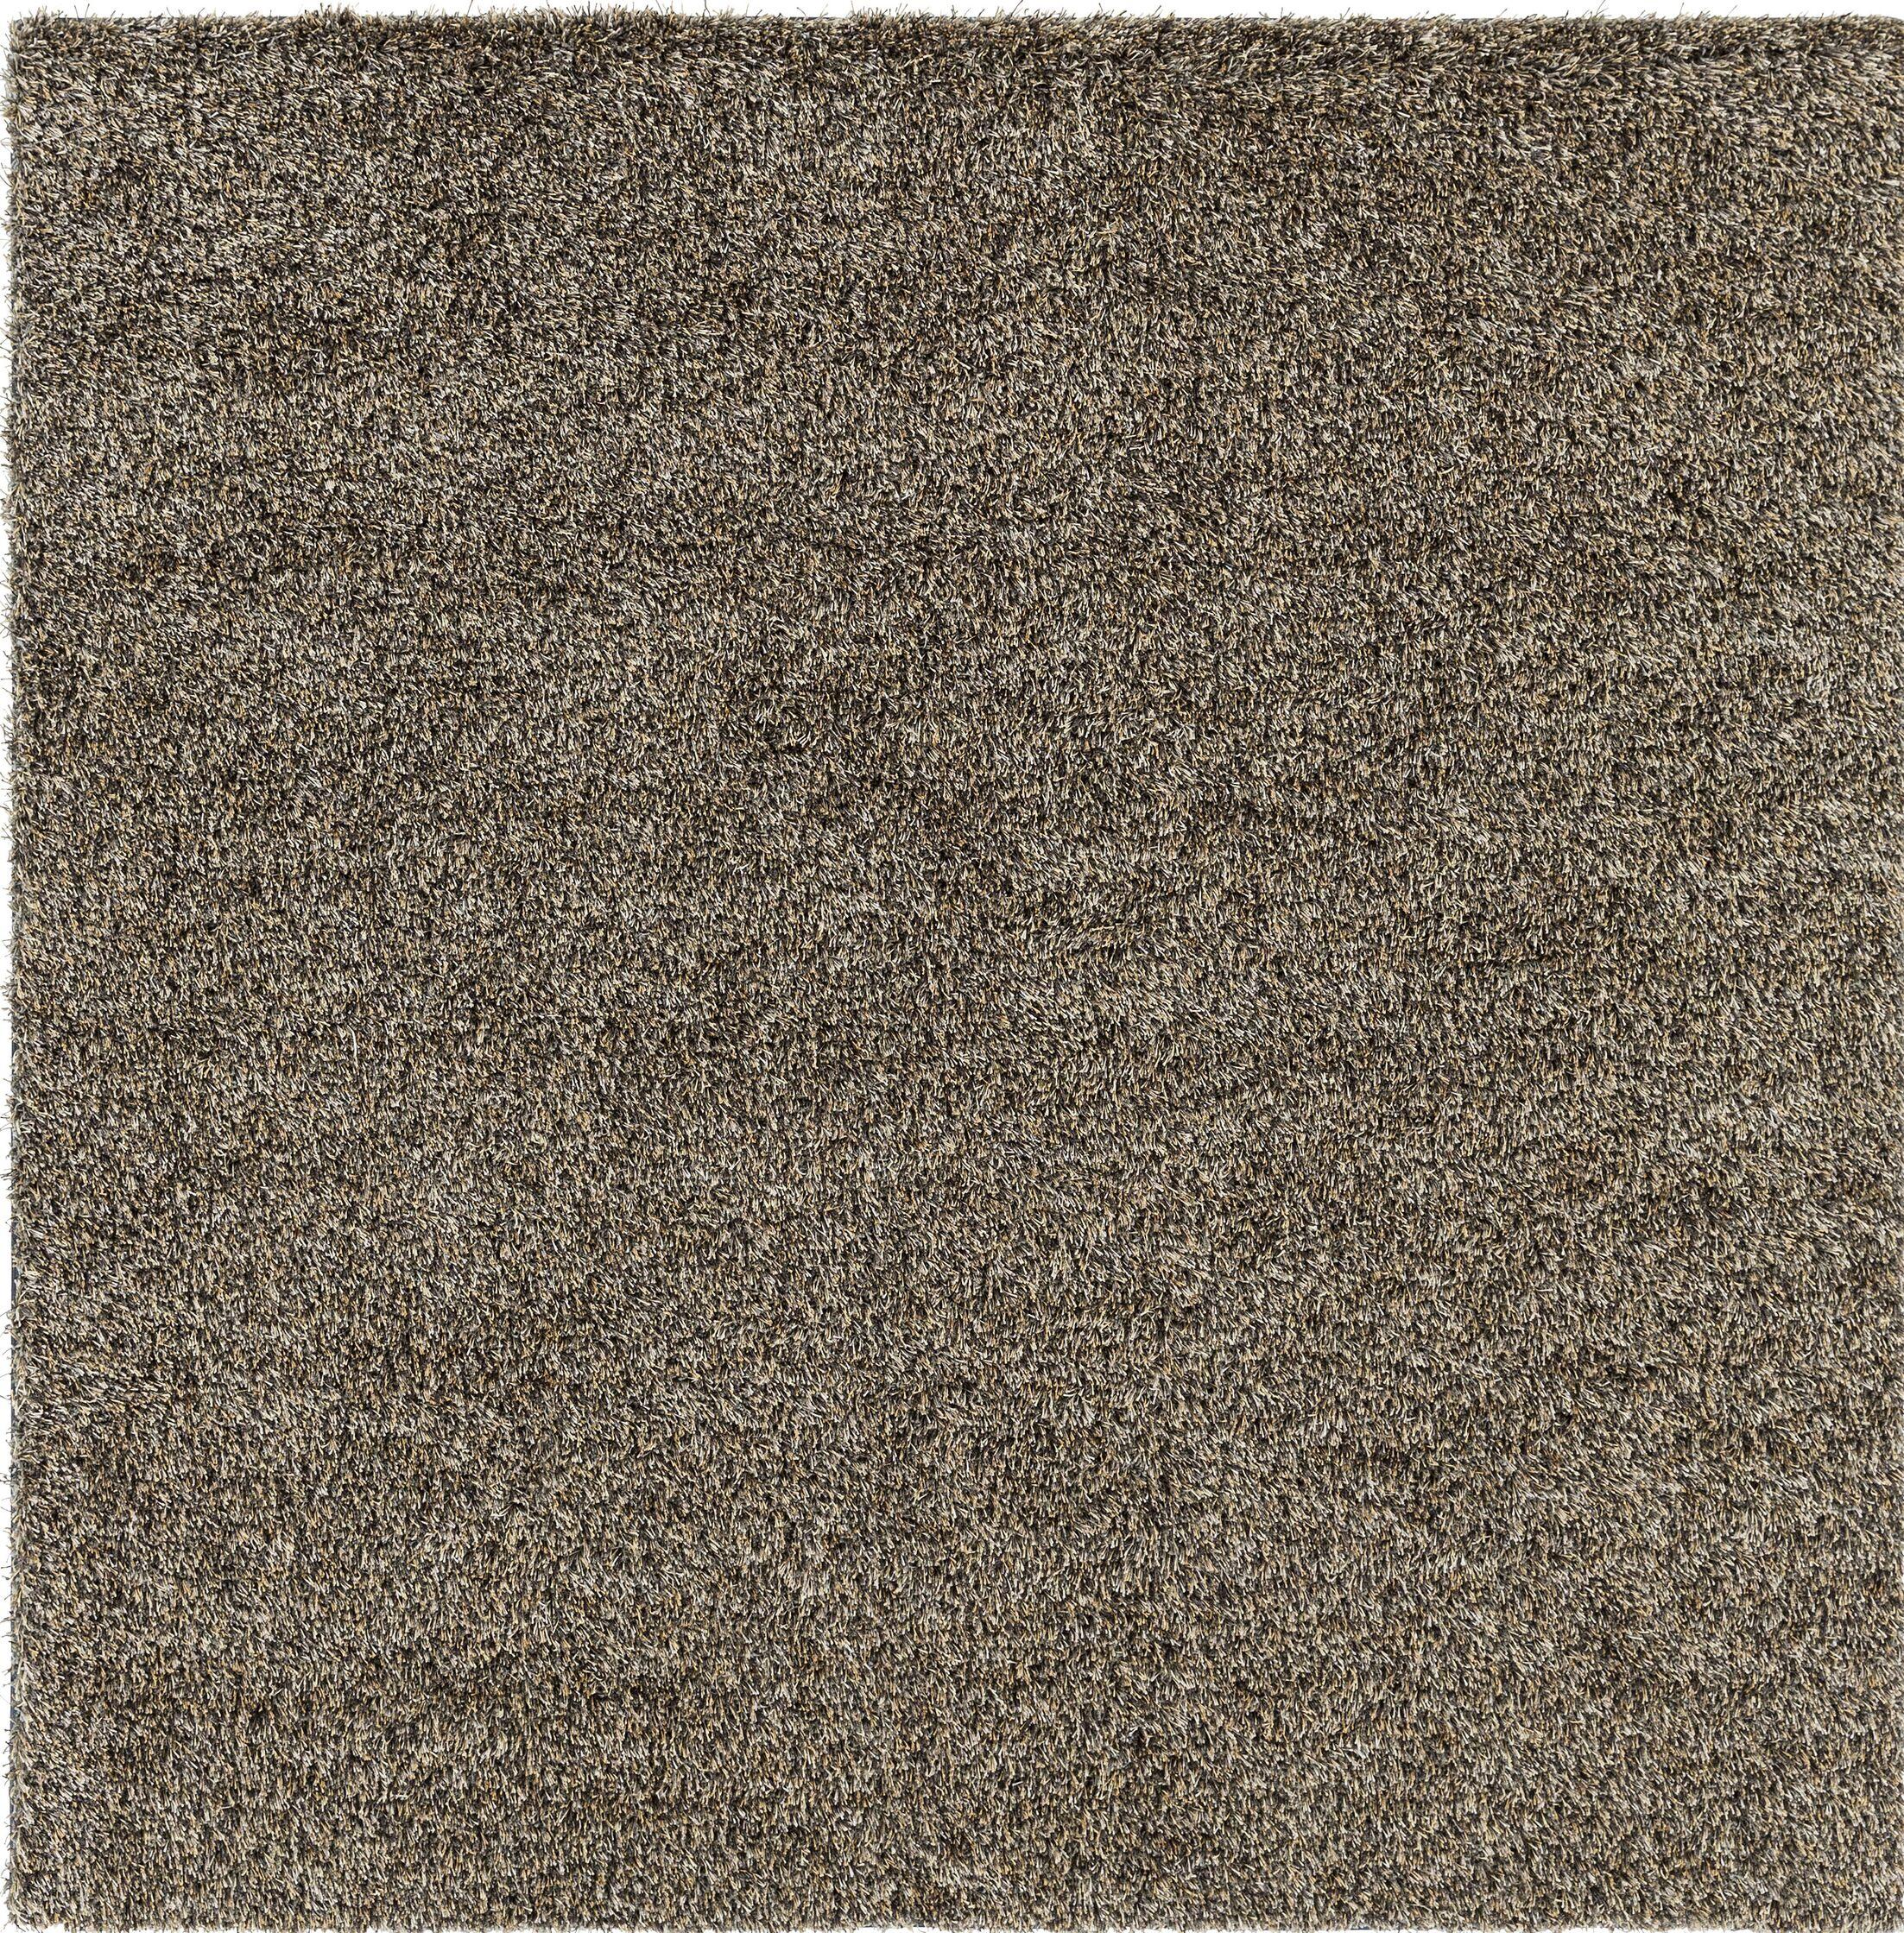 Dulcia Gray Area Rug Rug Size: Square 6'